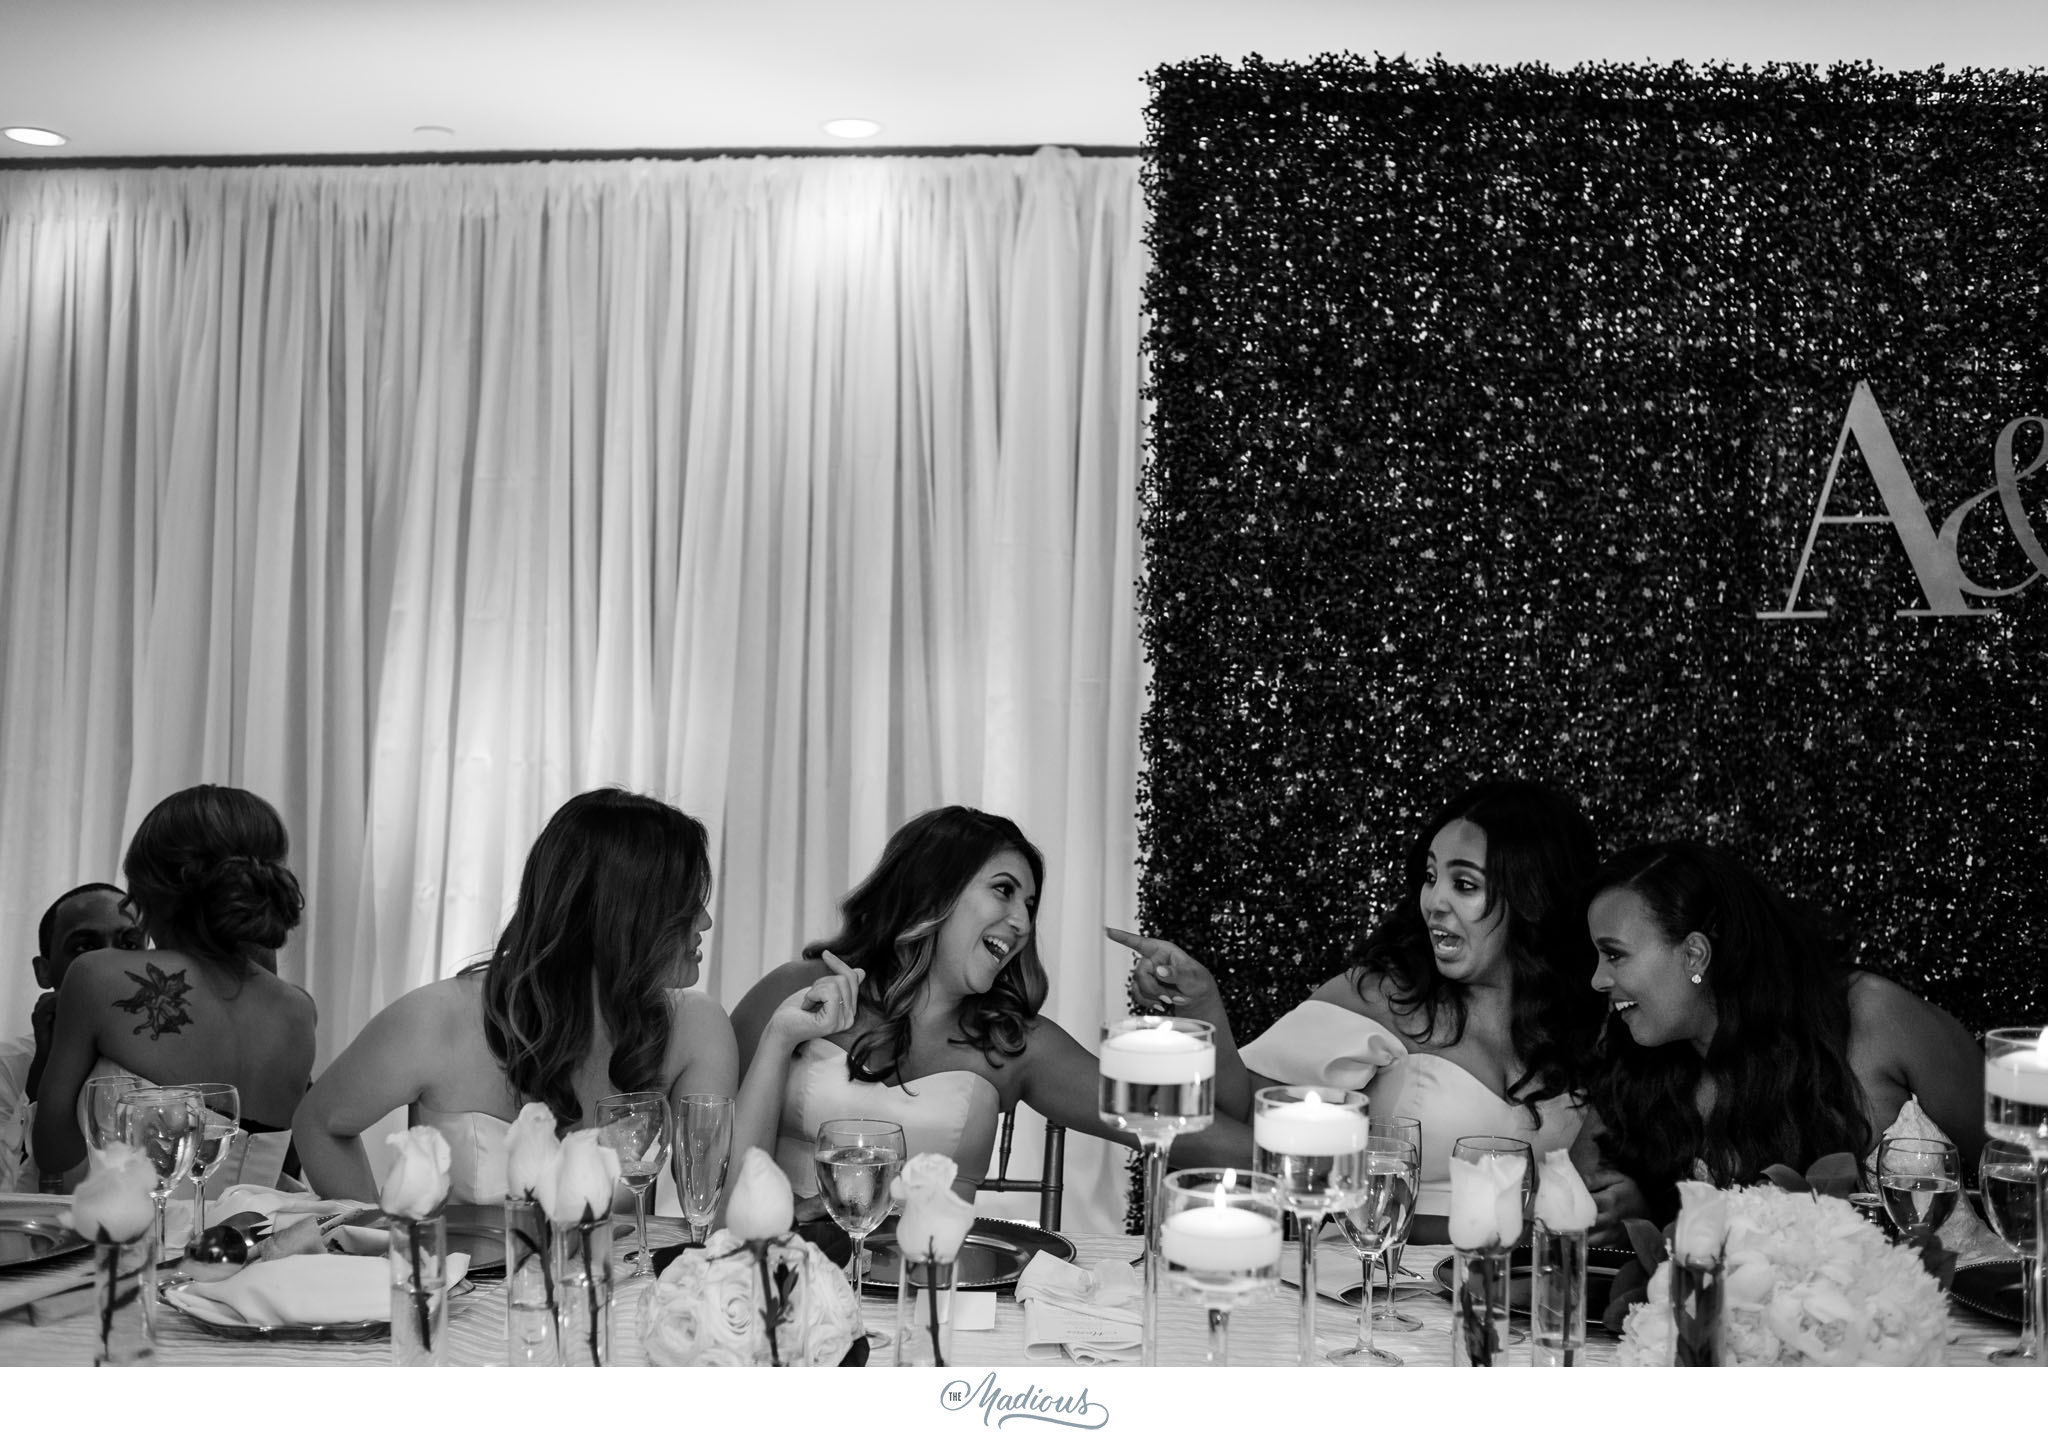 nmwa+wedding,+women+in+the+arts+wedding,+ethiopian+wedding,+dc+wedding+0185.jpg